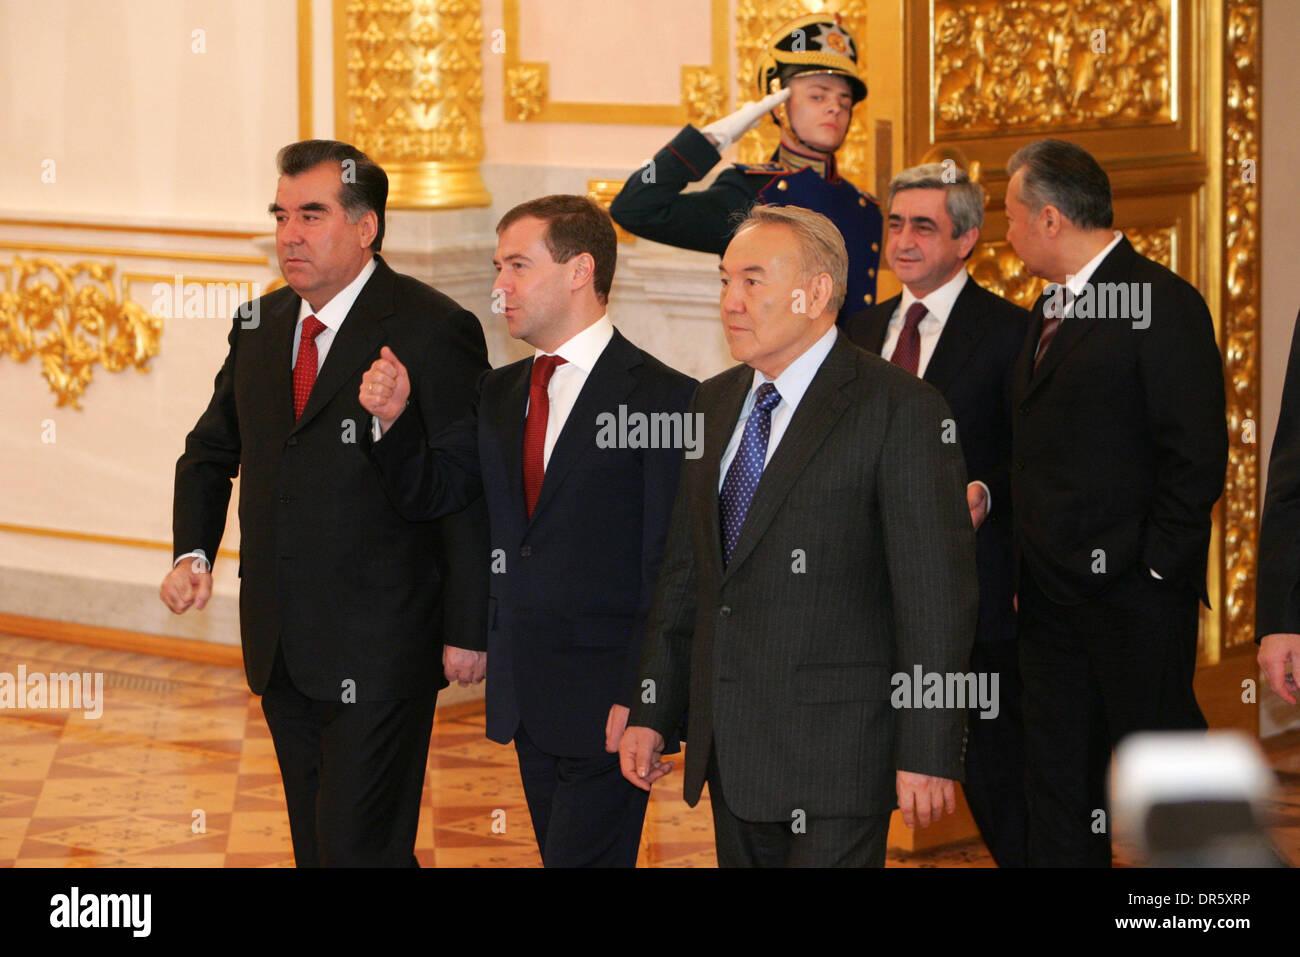 Feb 04, 2009 - Moscow, Russia - CSTO (Collective Security Treaty Organization) Summit in Moscow. to focus on setting up joint military force. Pictured: Pictured: (L-R) Tajik President EMOMALI RAKHAMON, President of Russia DMITRY MEDVEDEV, Kazakh President NURSULTAN NAZARBAYEV, (back): Armenian President SERZH SARGSYAN and  Kyrgyz President KURMANBEK BAKIYEV. (Credit Image: © PhotoX - Stock Image